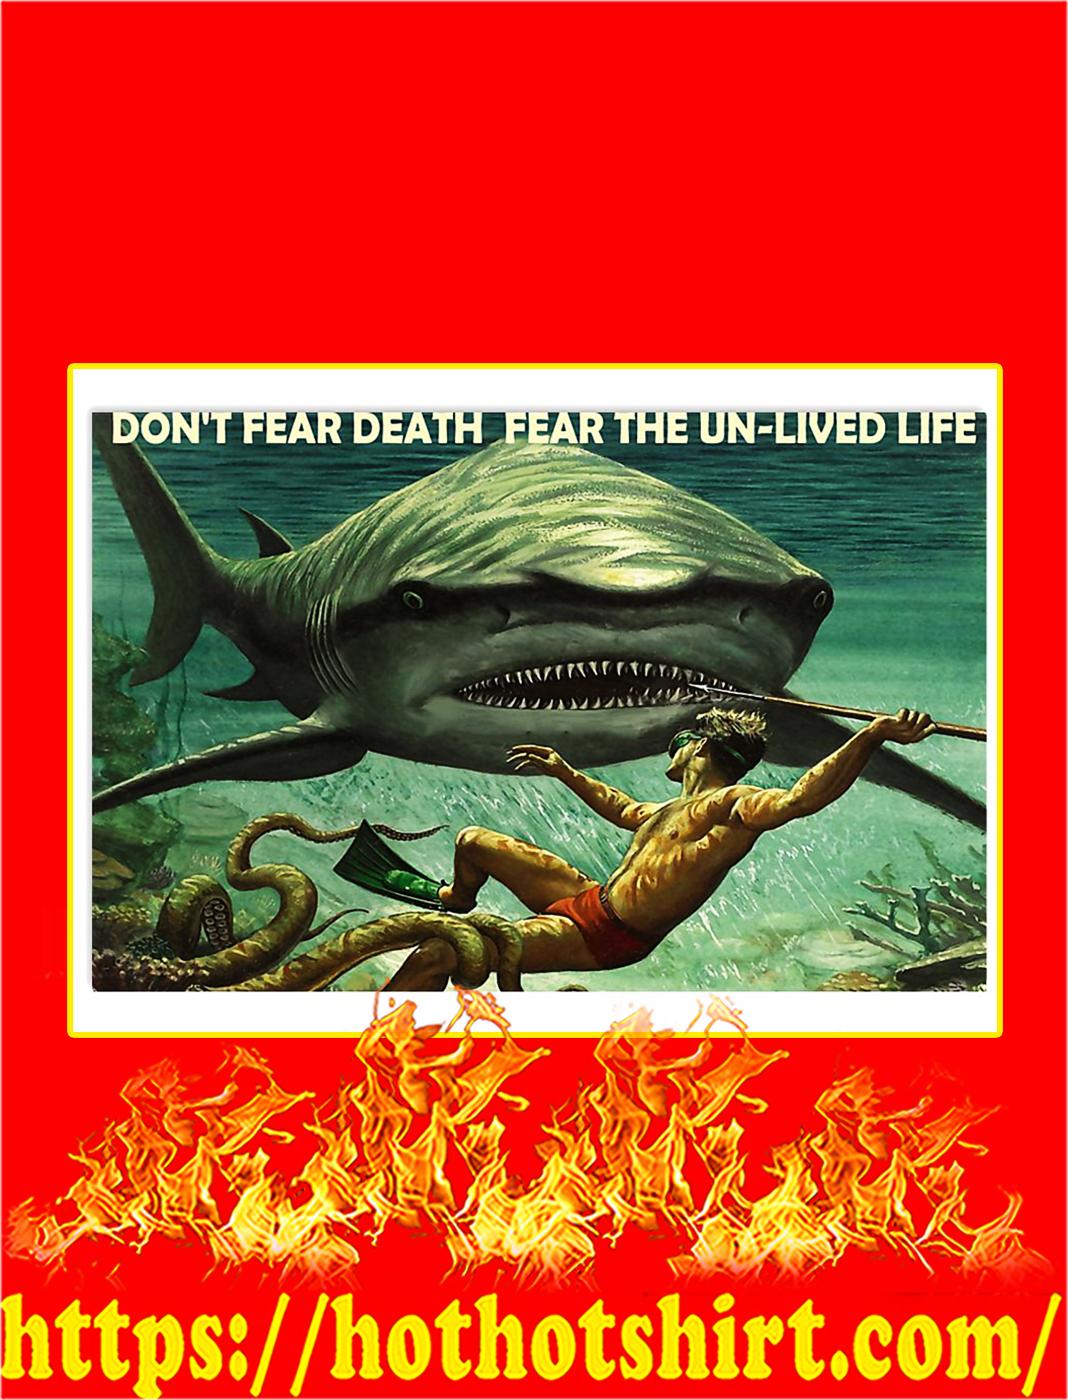 Scuba shark Don't fear death fear the un-lived life poster - A3